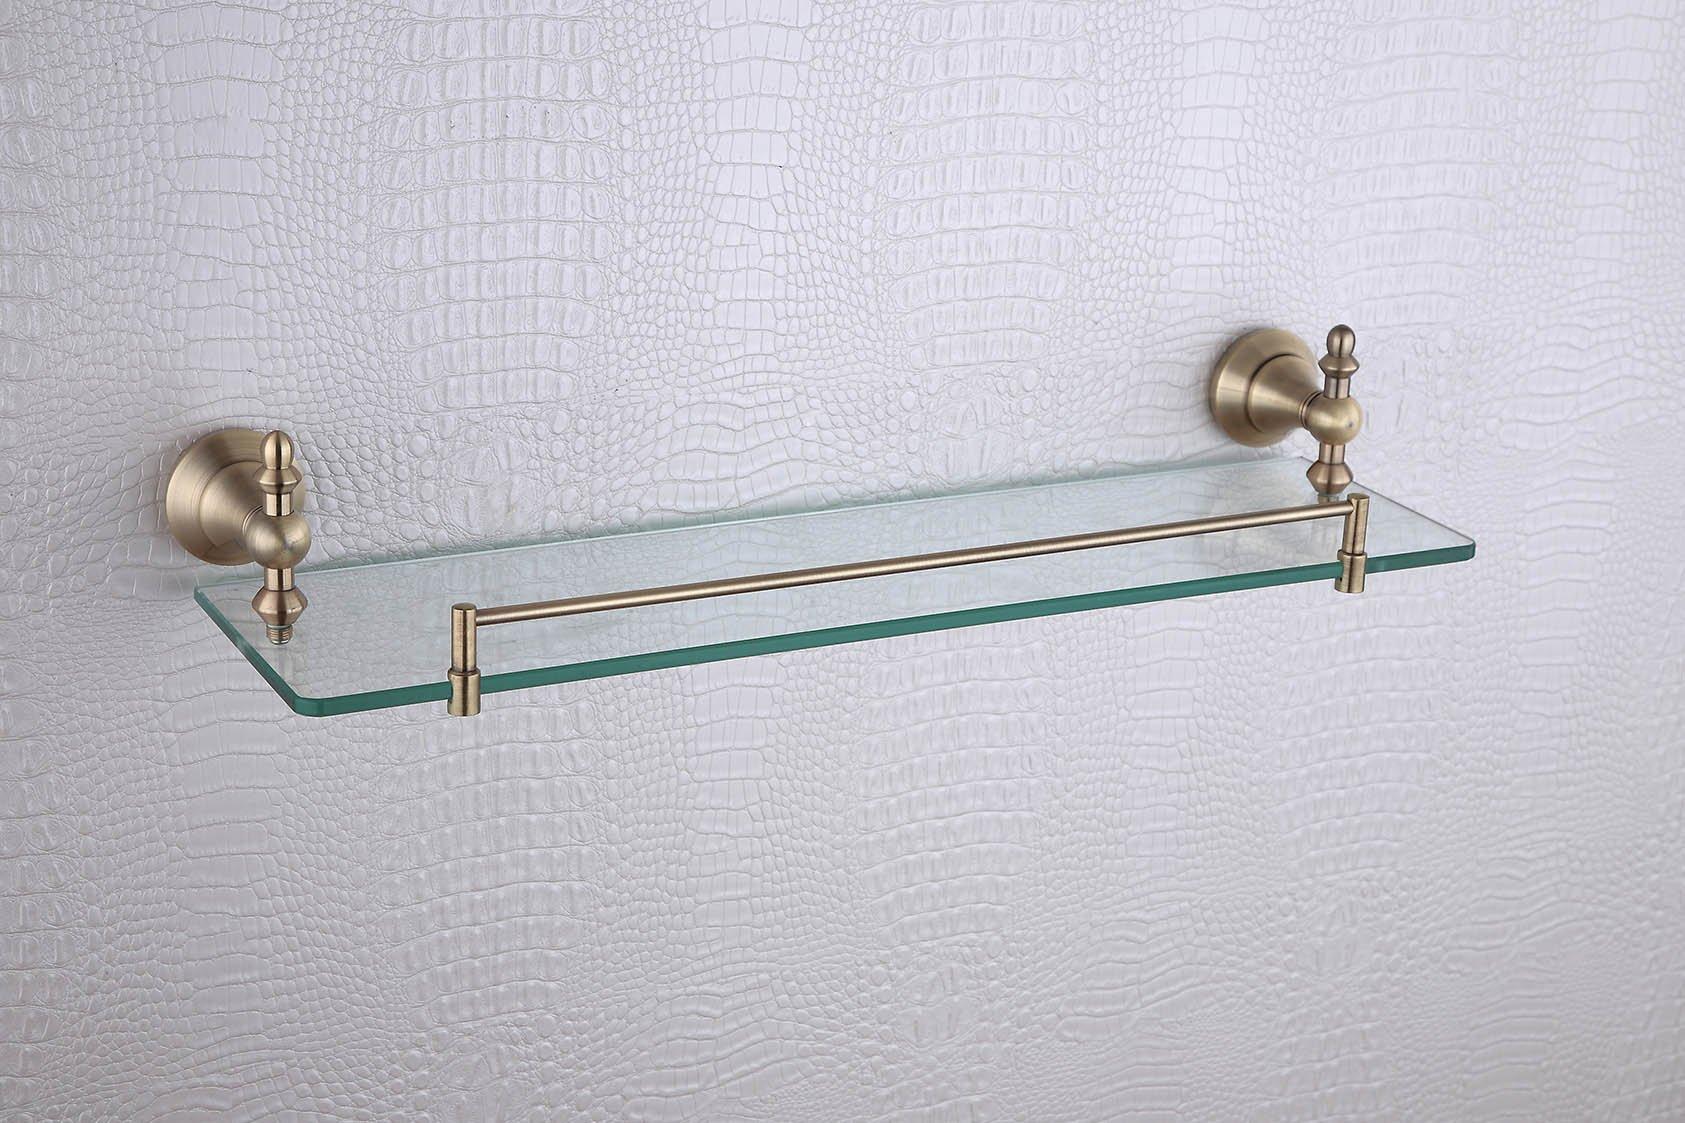 Cloud Power Stylish Vintage Style Bathroom Brass Single Glass Shelves Single Glass Shelves With Titanium Wall-mounted Single Glass Shelves